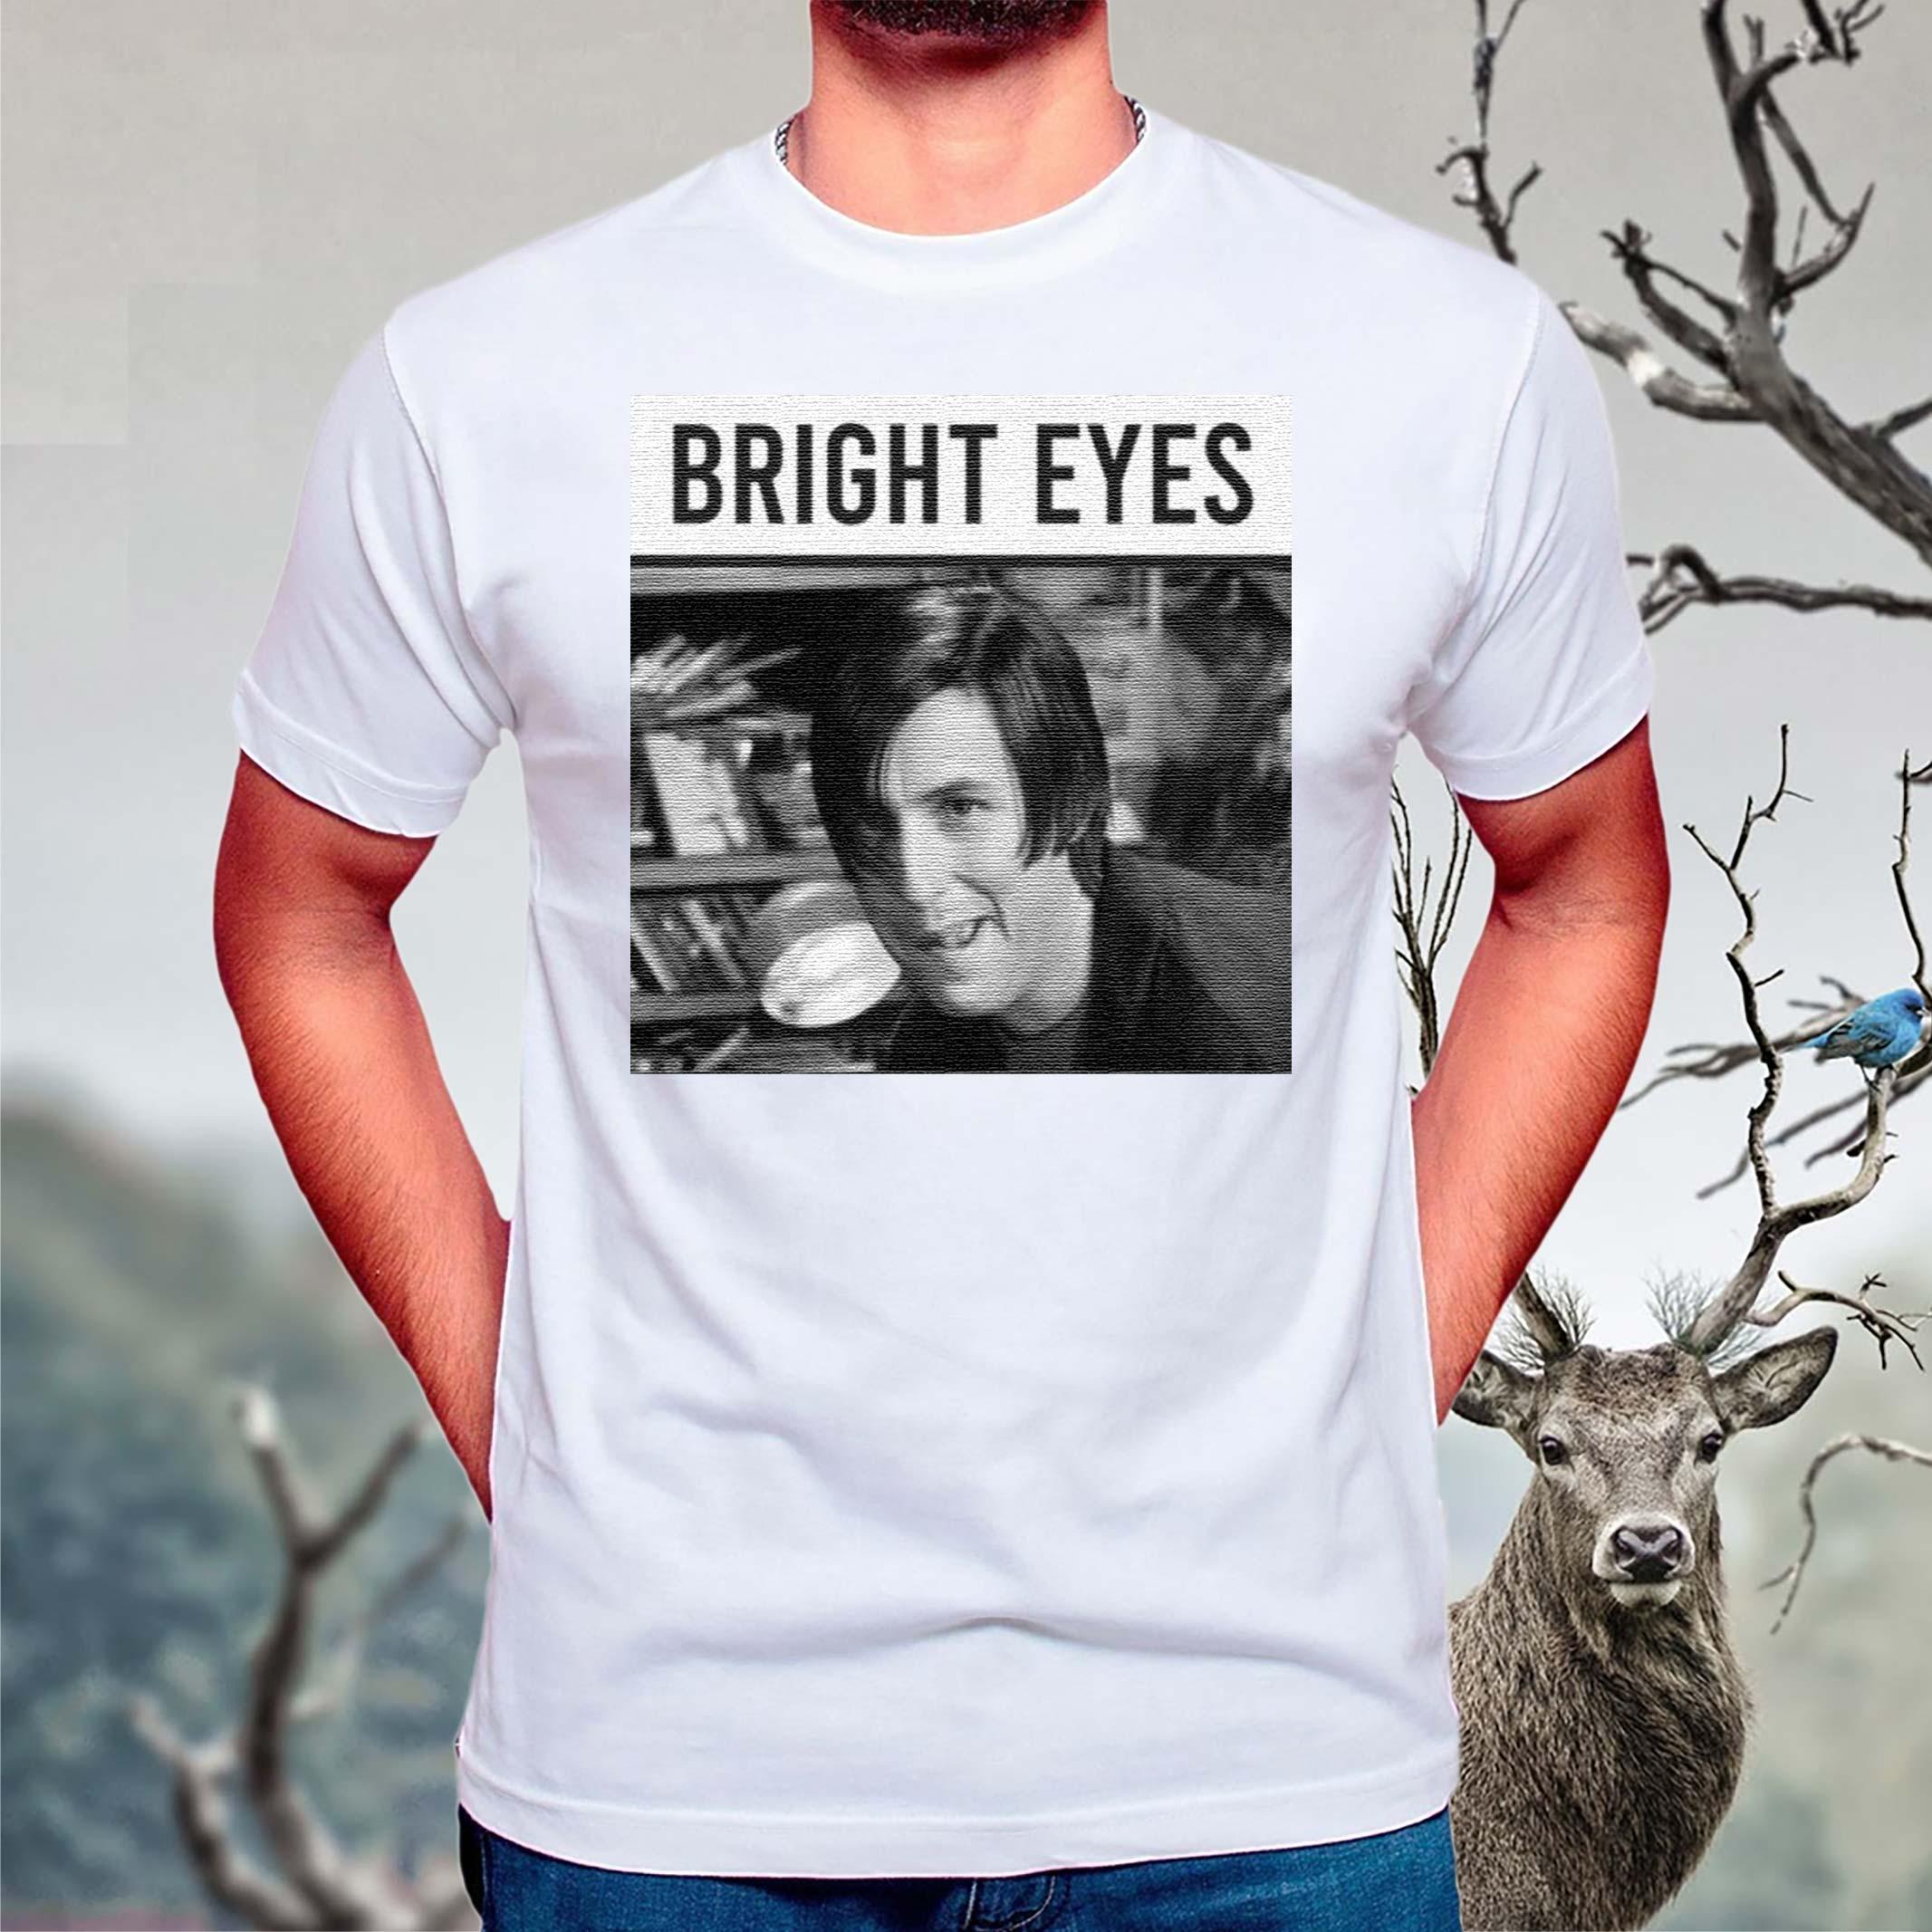 Little-Nicky-bright-eyes-t-shirt